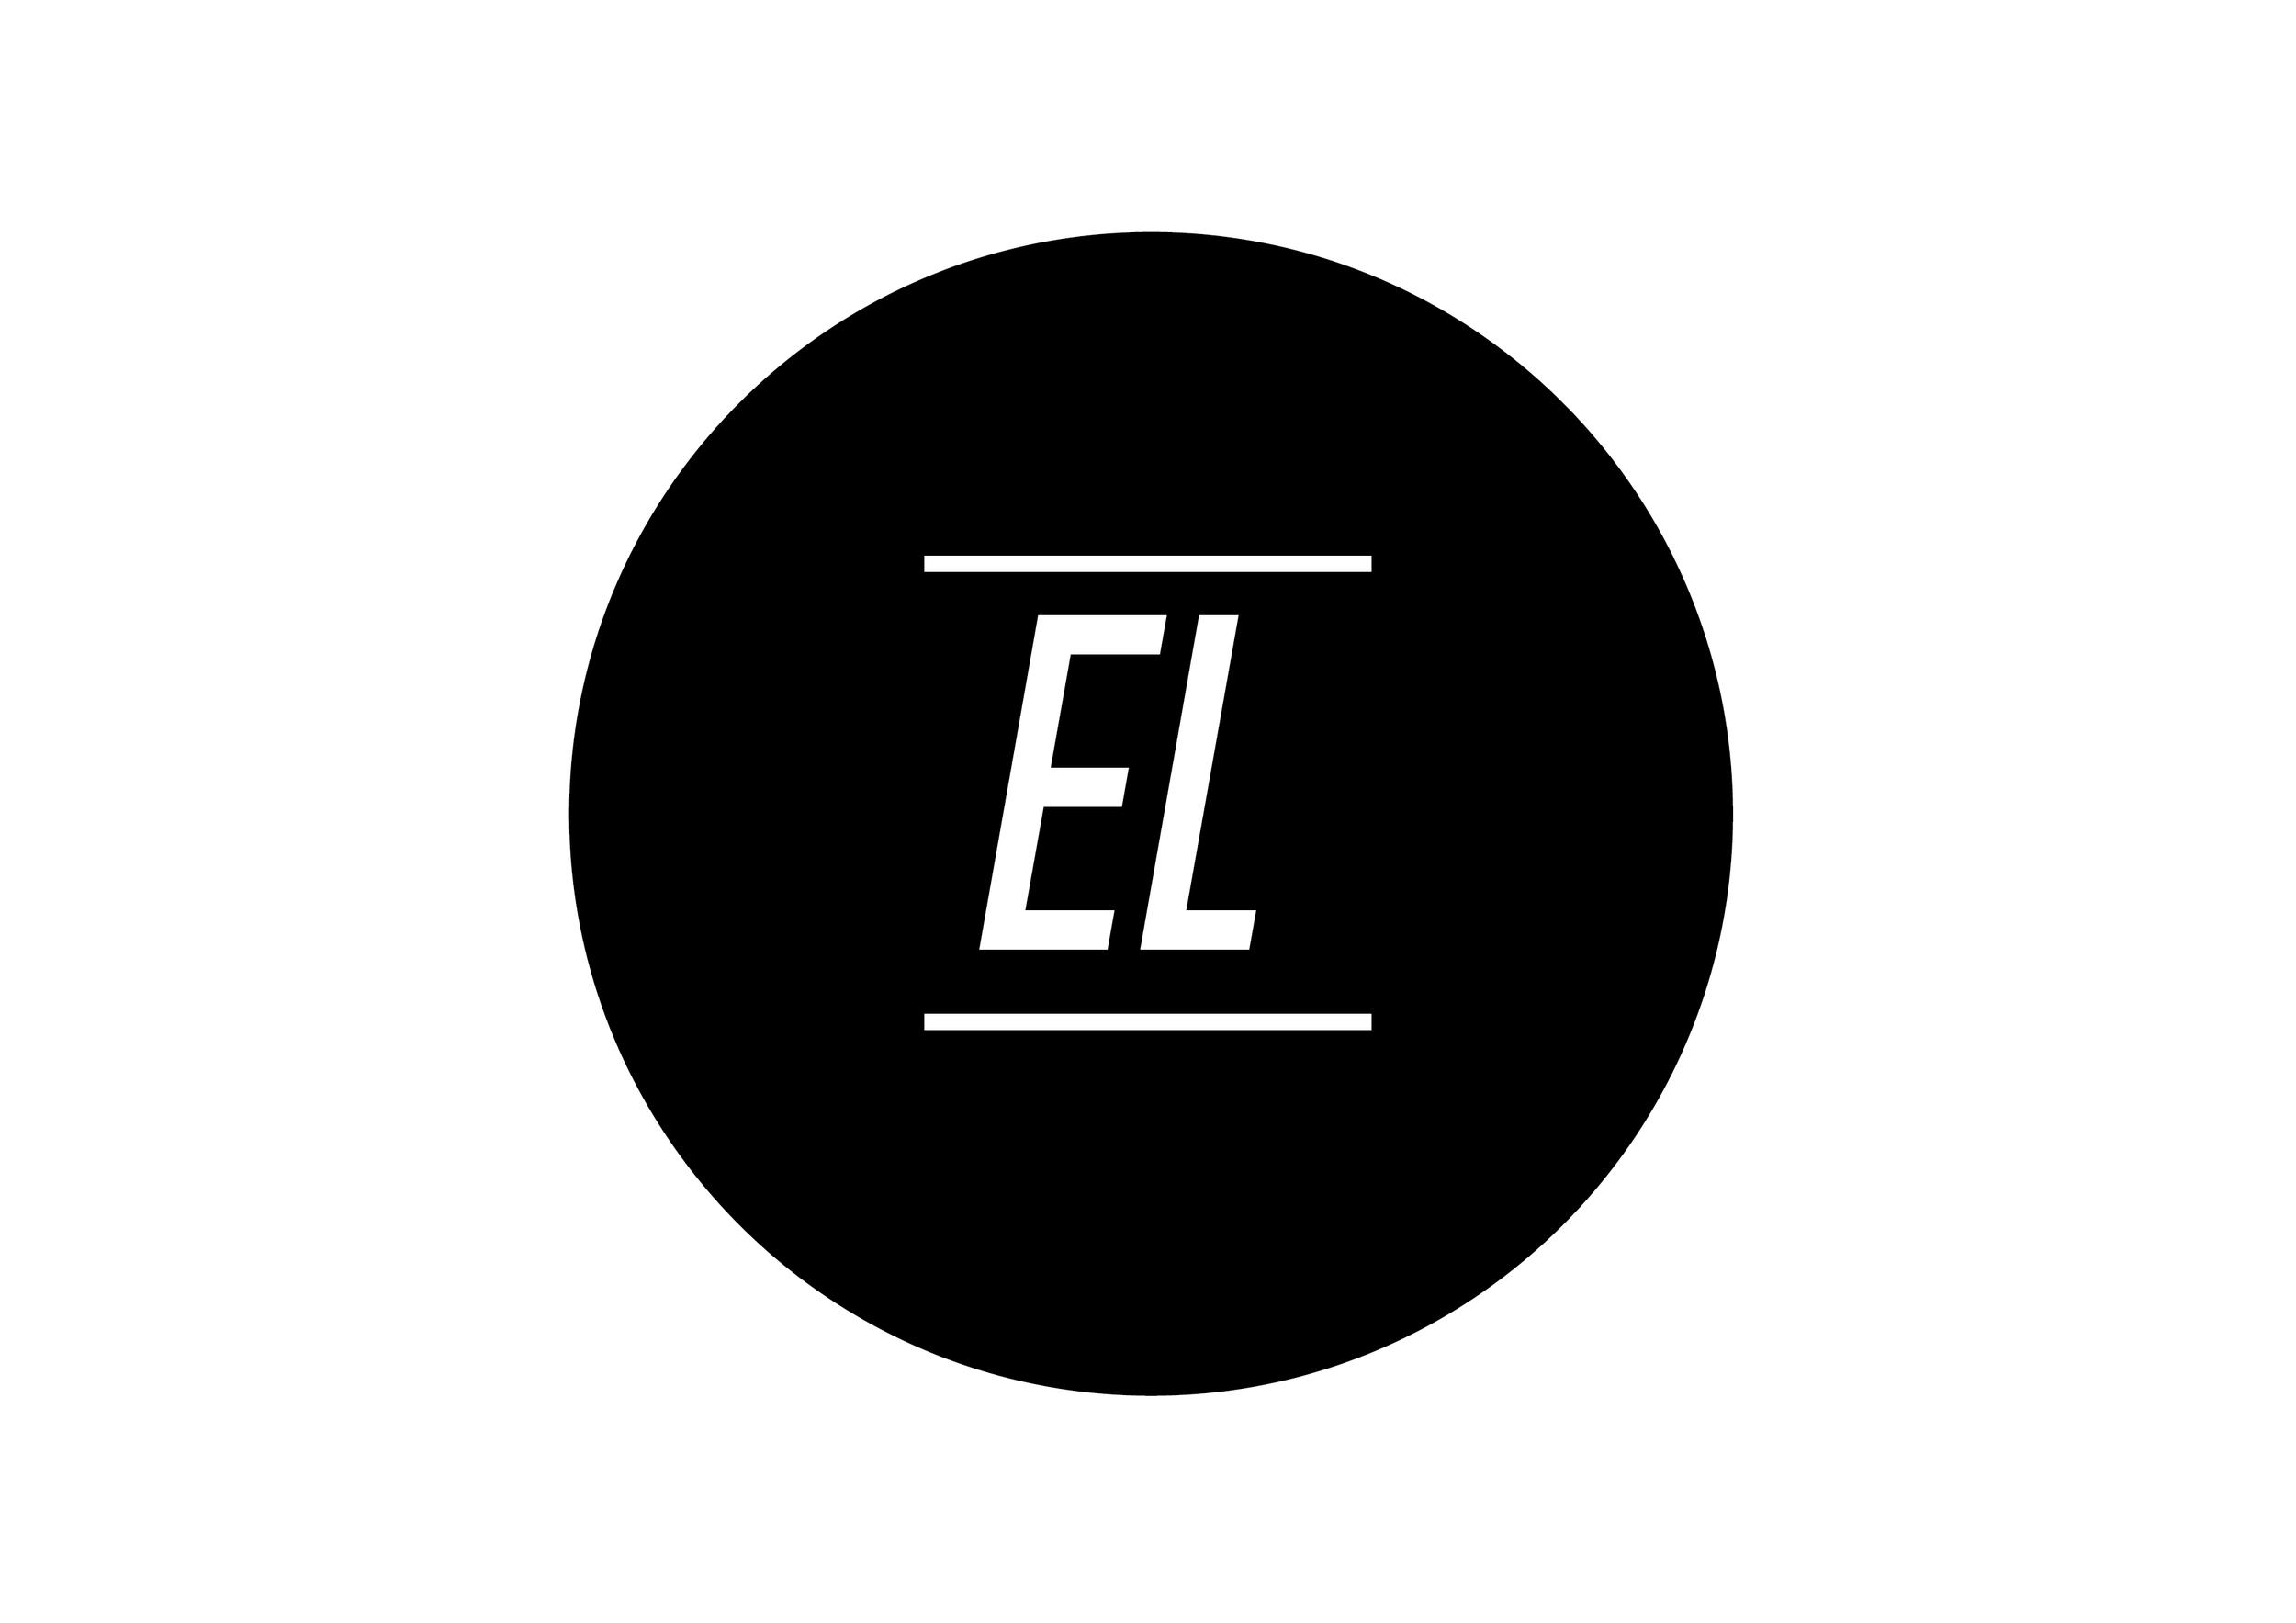 http://www.esmondleung.com // first favicon icon // 3.24.14